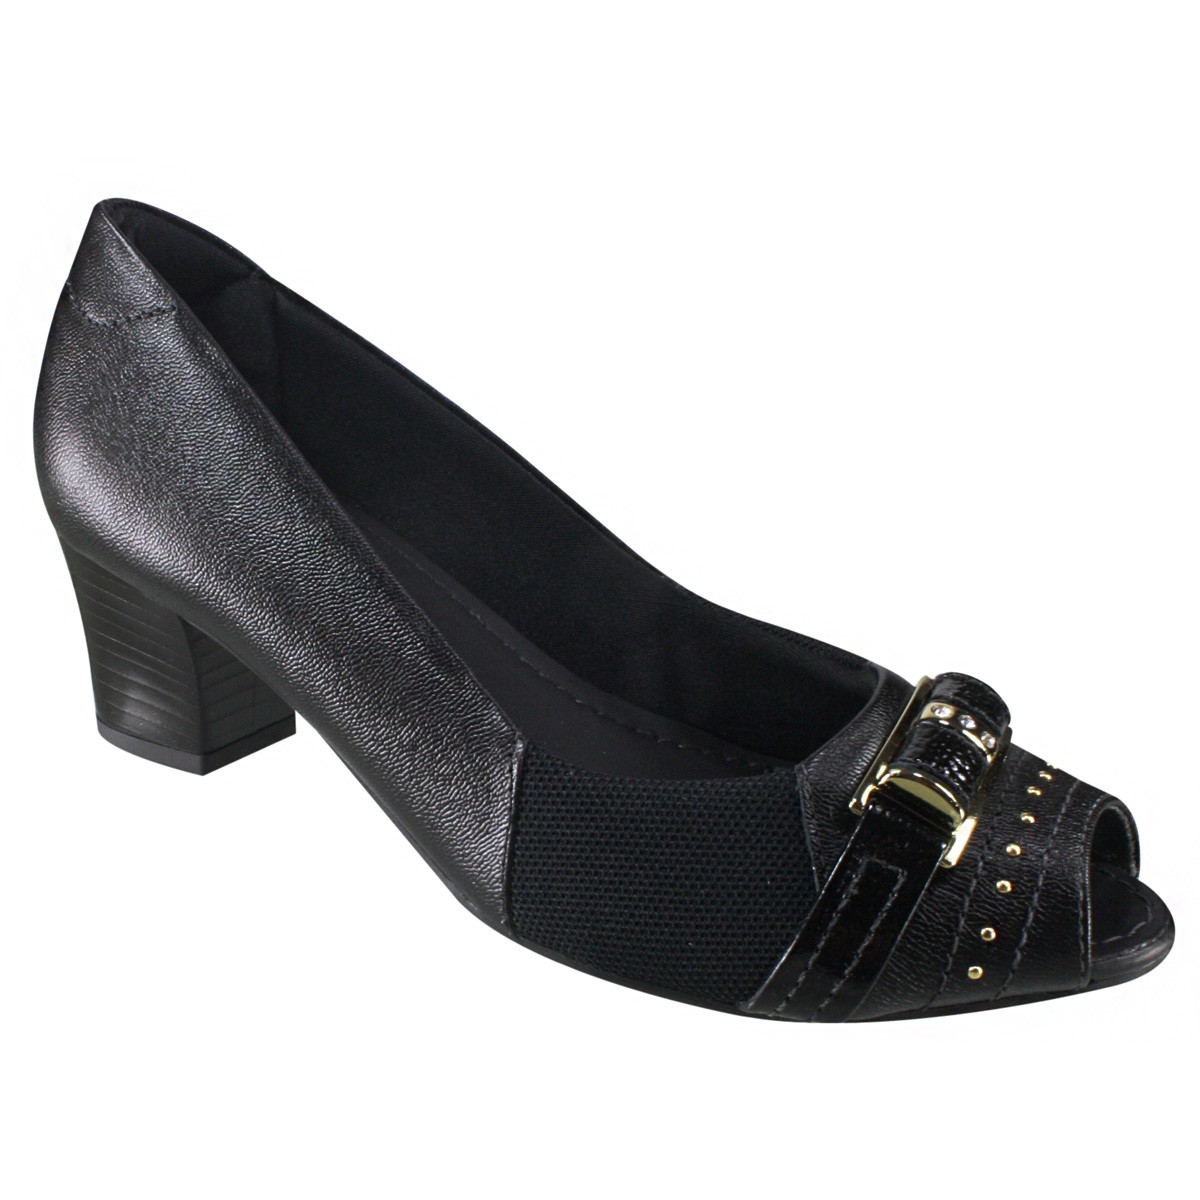 73fb50b7c Sapato Feminino Usaflex Peep Toe Q6612 01 - Preto (Caprina ...